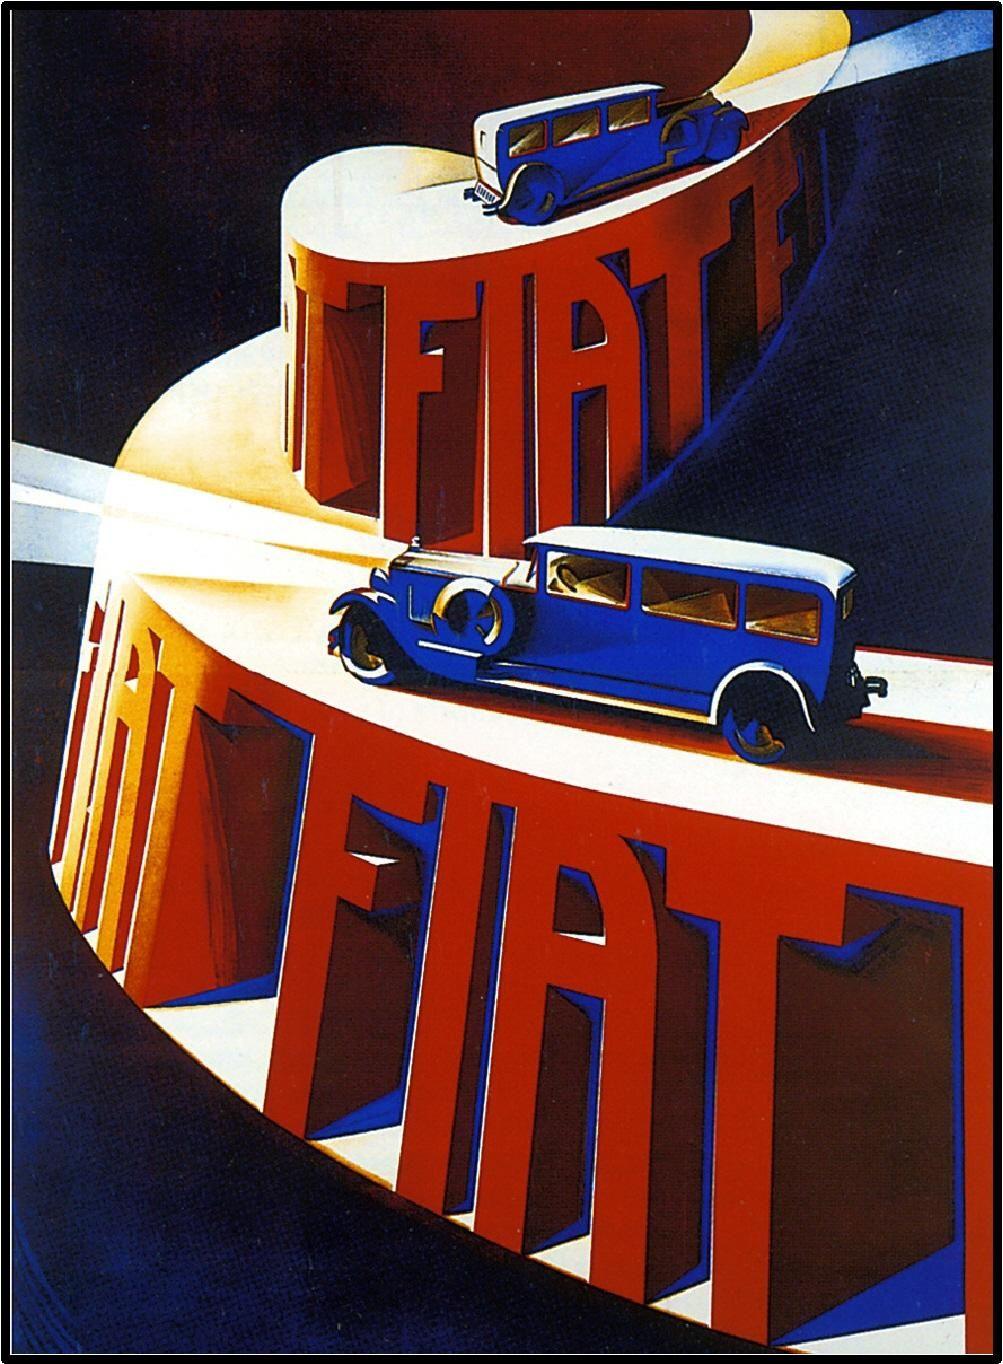 Poster design 1900 - Fiat Automobile Vintage Automobile Poster 1900 Http Retrographik Com